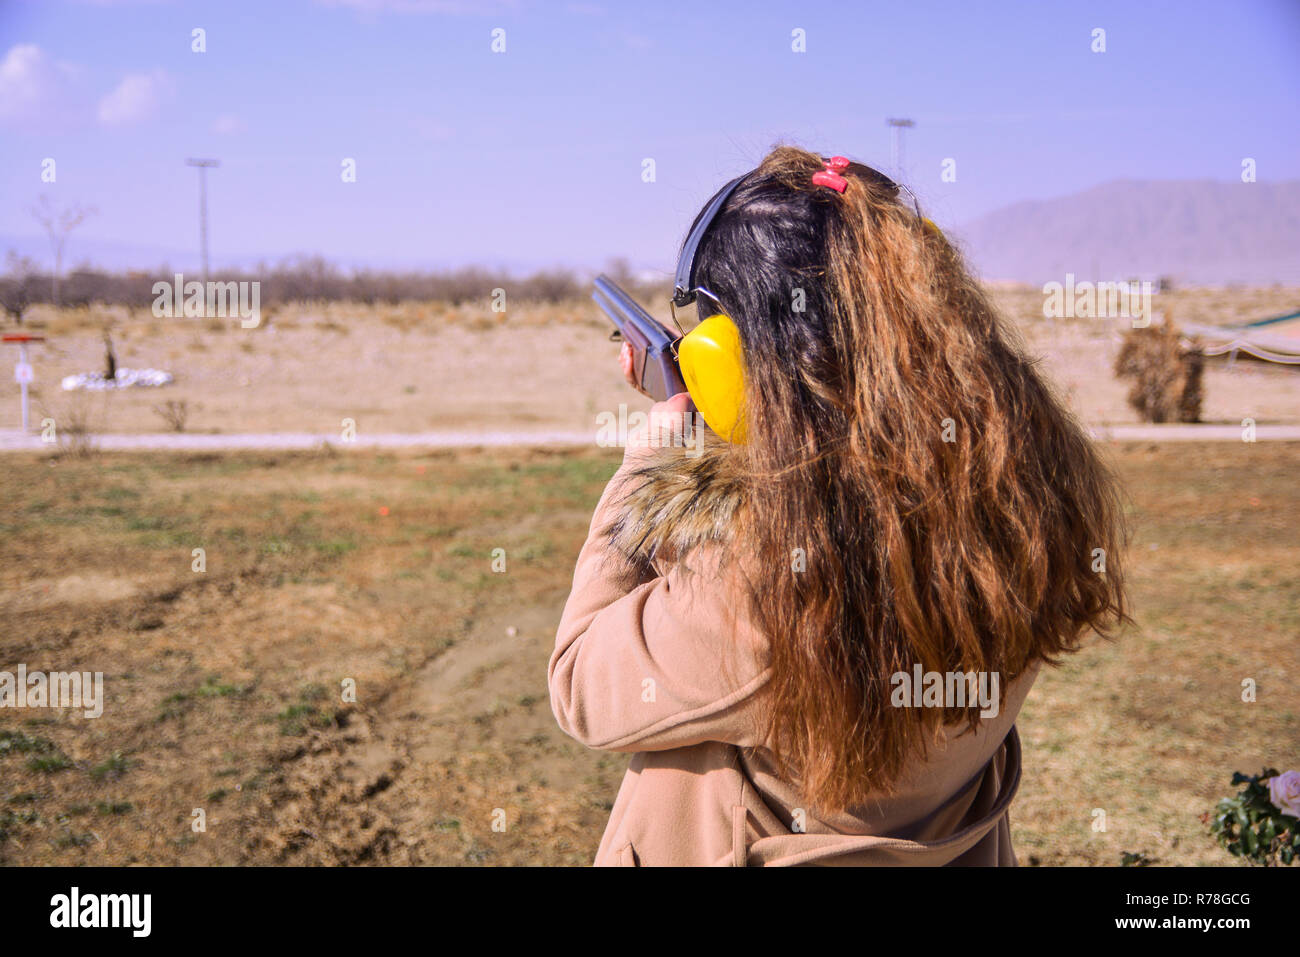 A girl firing with Skeet Gun - Stock Image